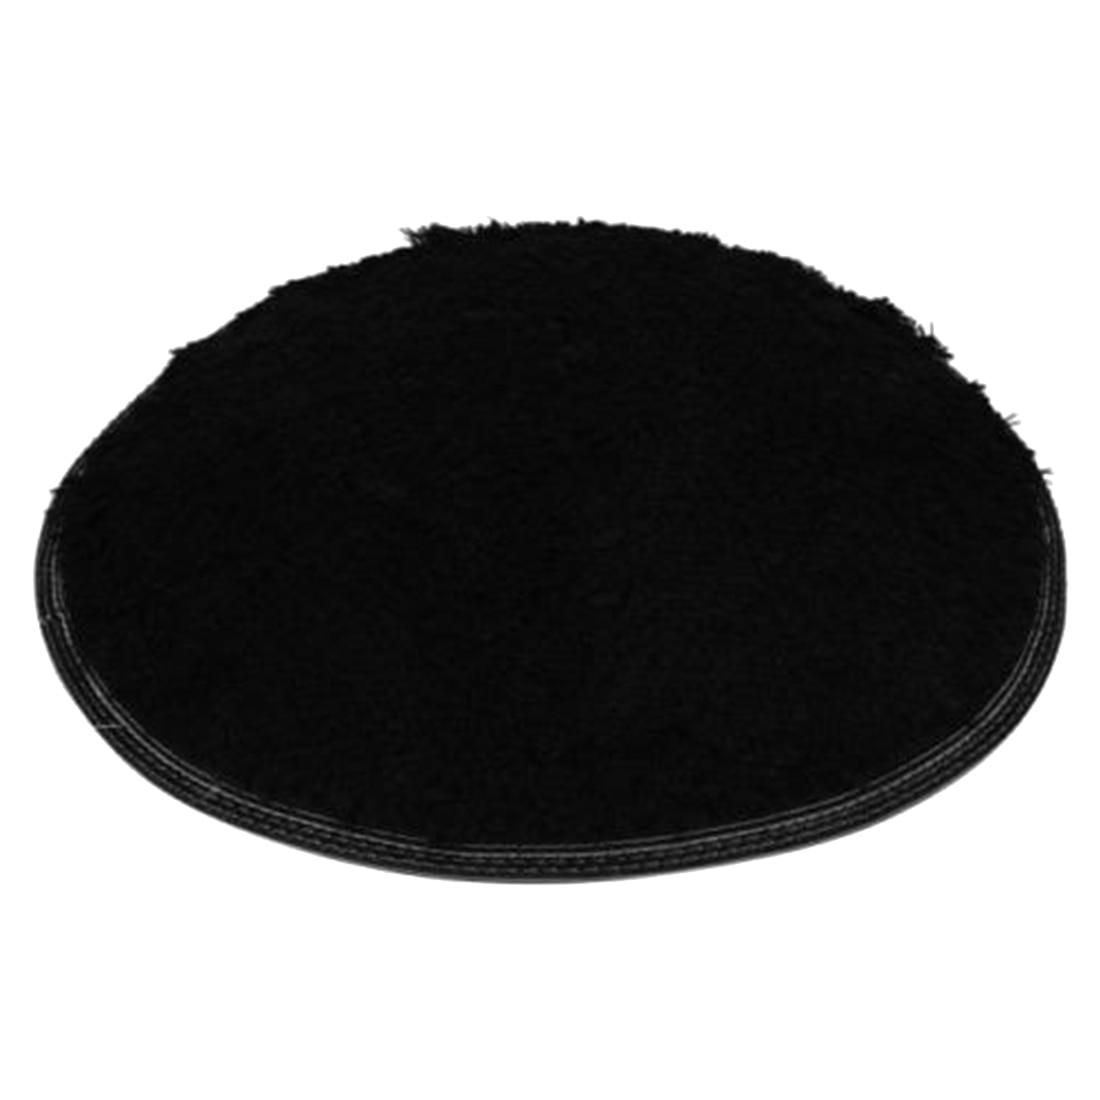 home decor soft bath bedroom floor shower yoga silky round mat rug nonslip black